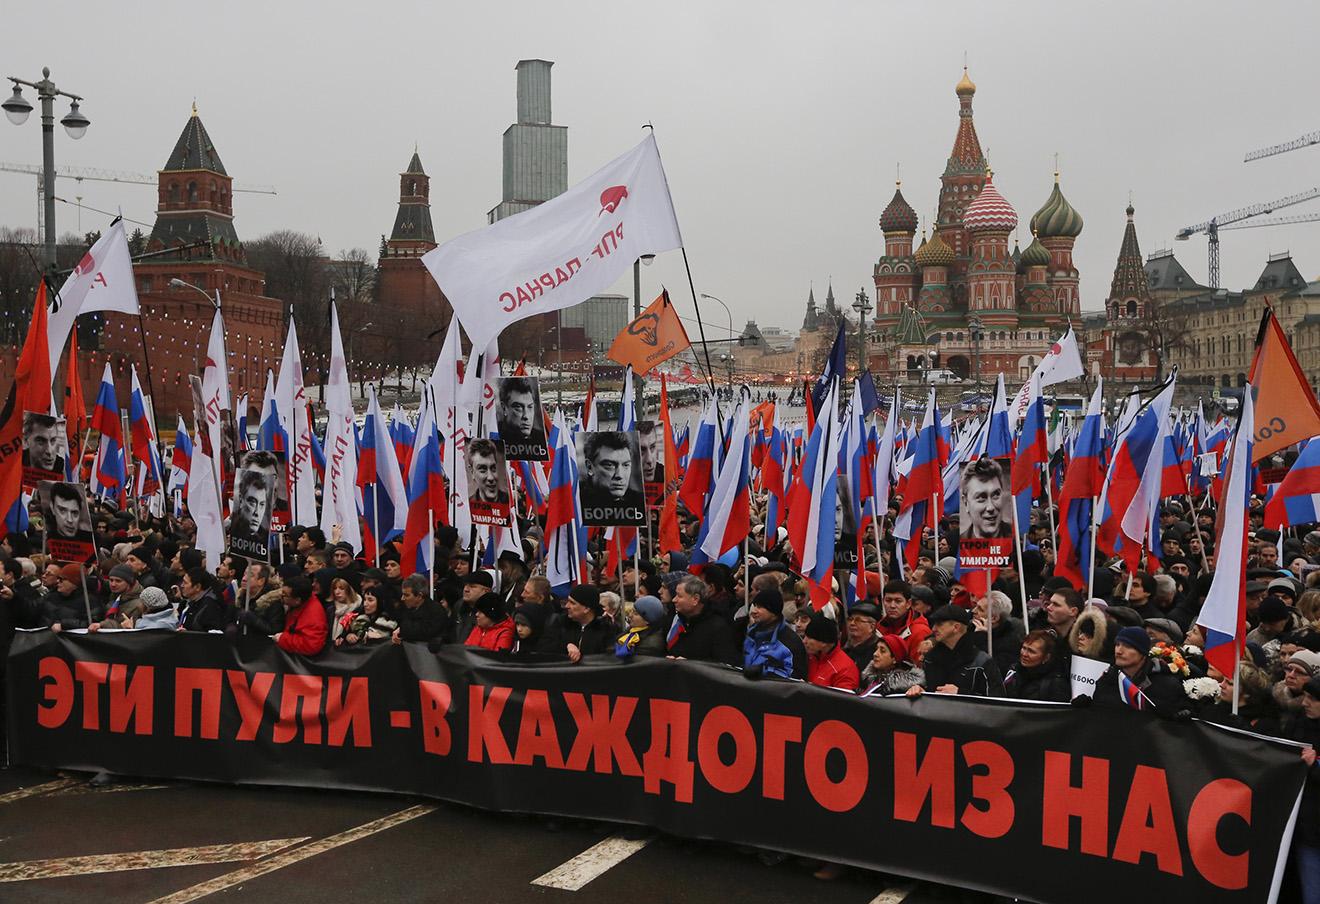 Марш памяти Бориса Немцова, 27 февраля 2016 год. Фото: Дмитрий Ловецкий / AP / East News